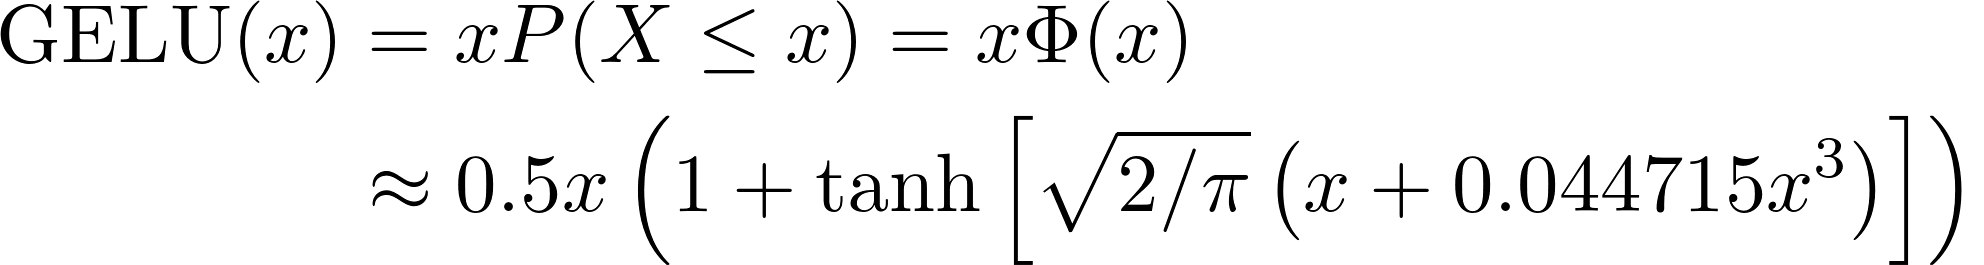 Transformer encoder